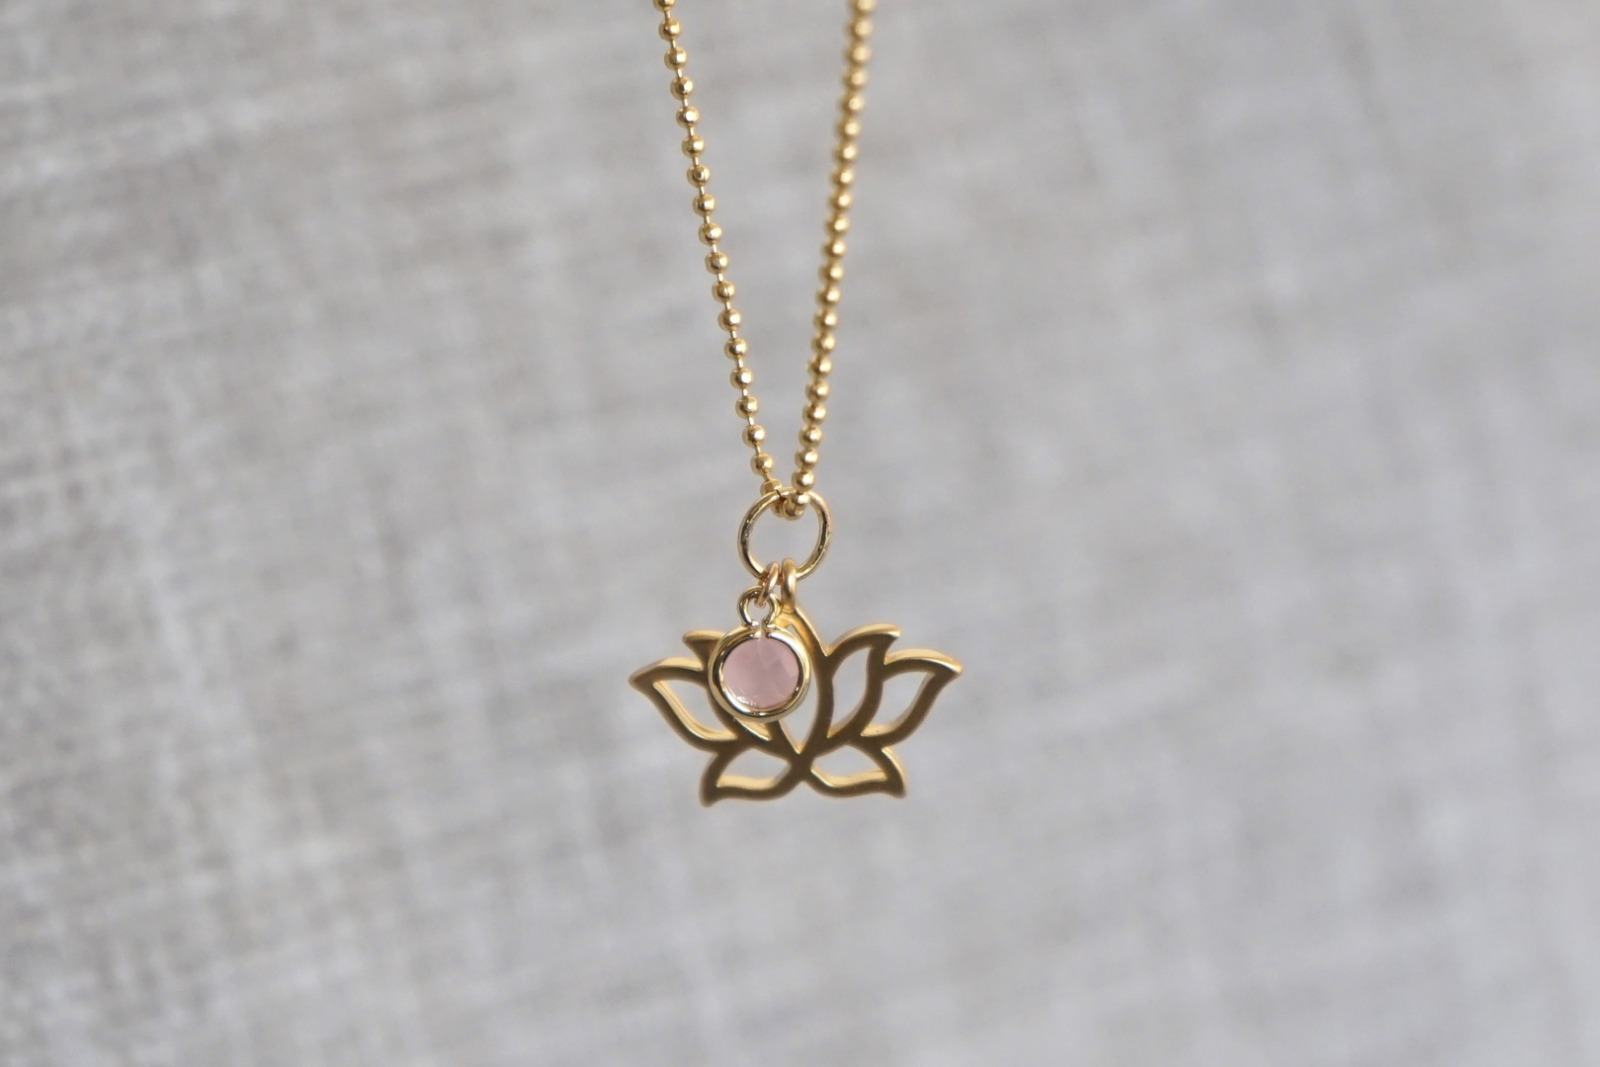 Kugelkette mit Lotusblüte und Kristall - rosa - 2